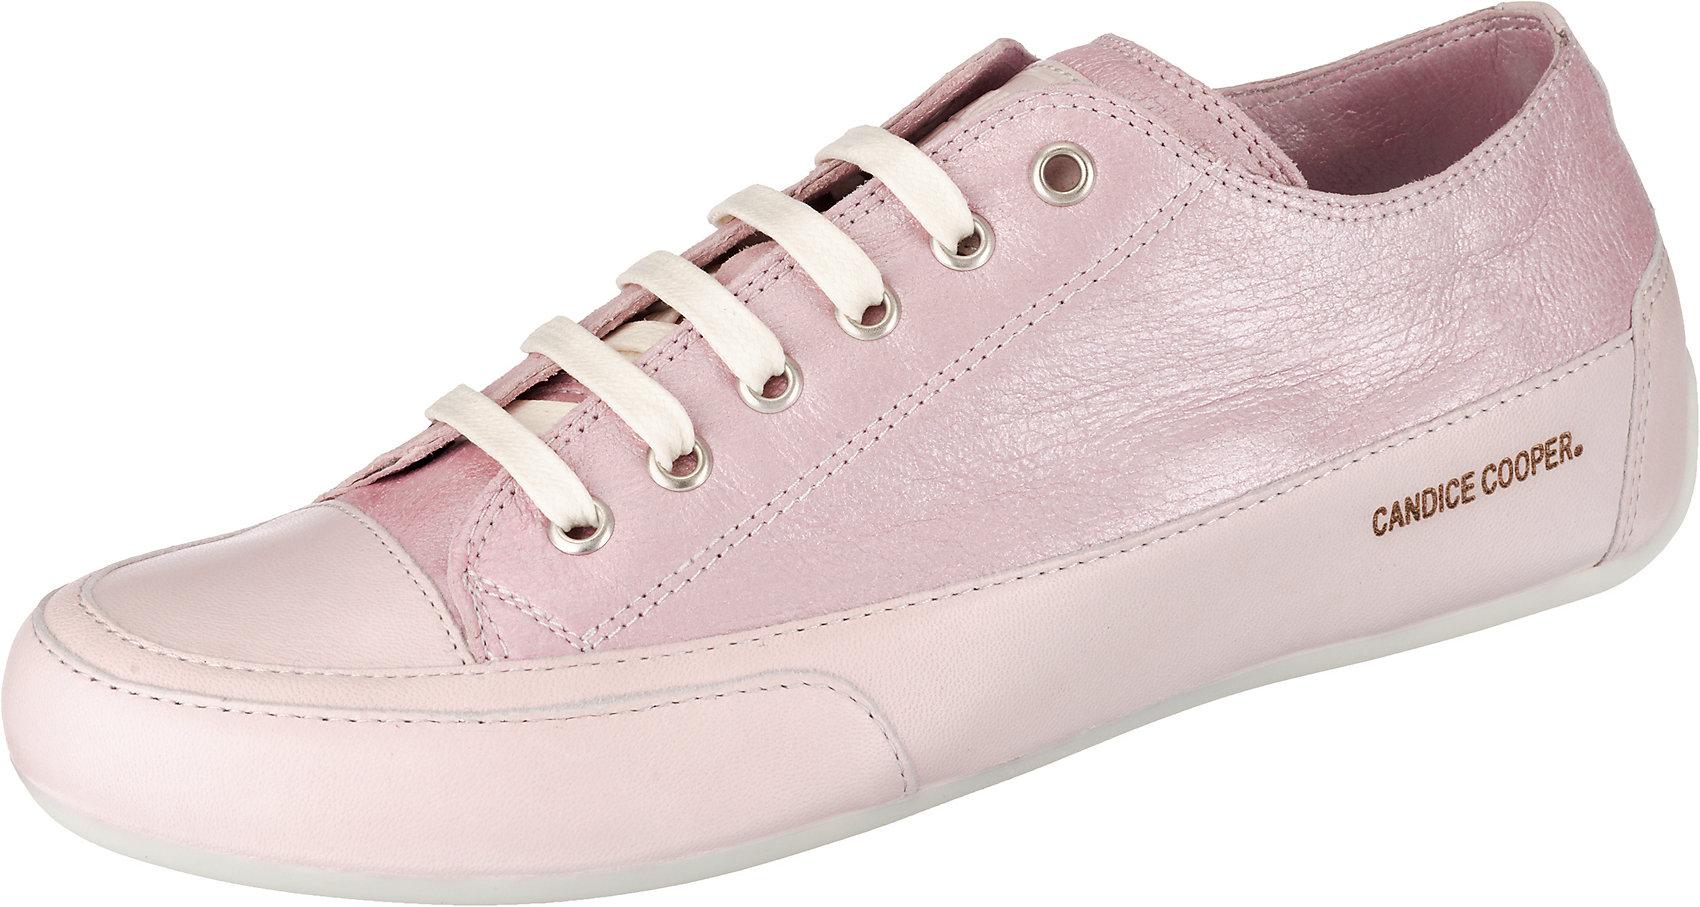 Details Rosa 9641713 Sneakers Für Candice Cooper Damen Neu Zu Low OiPkTwZXu